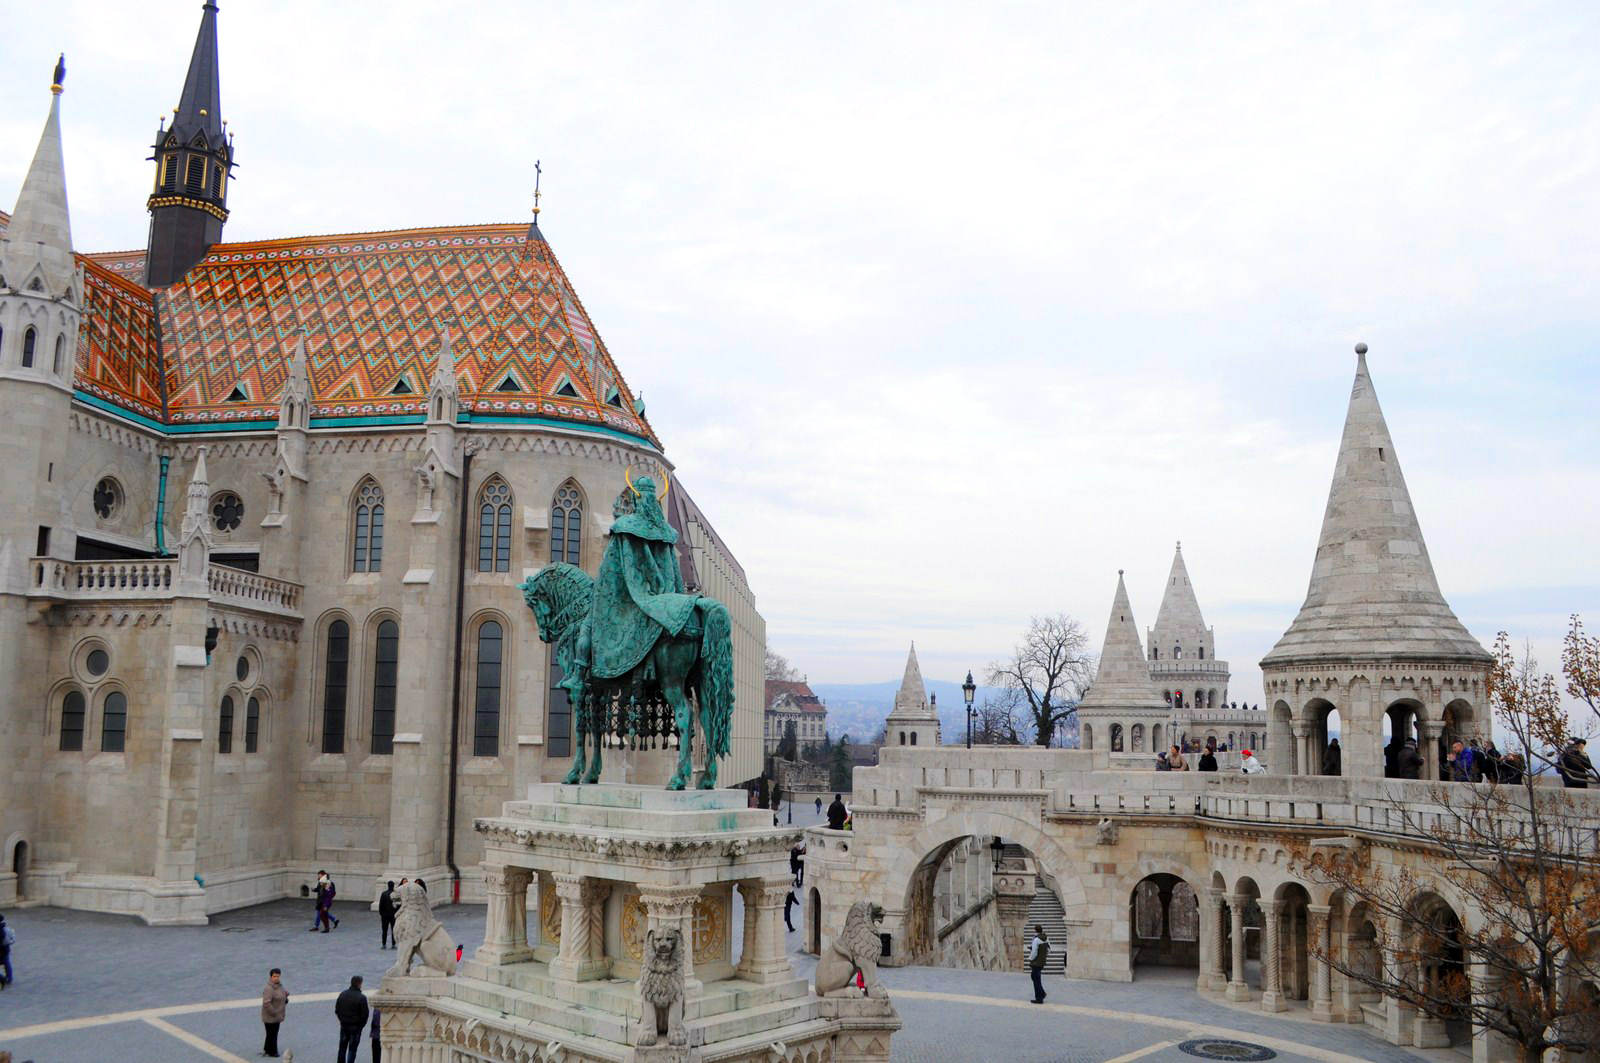 Qué ver en Budapest en un fin de semana: Bastión de los Pescadores budapest en un fin de semana - 21234233630 7551953ba4 o - Qué ver en Budapest en un fin de semana